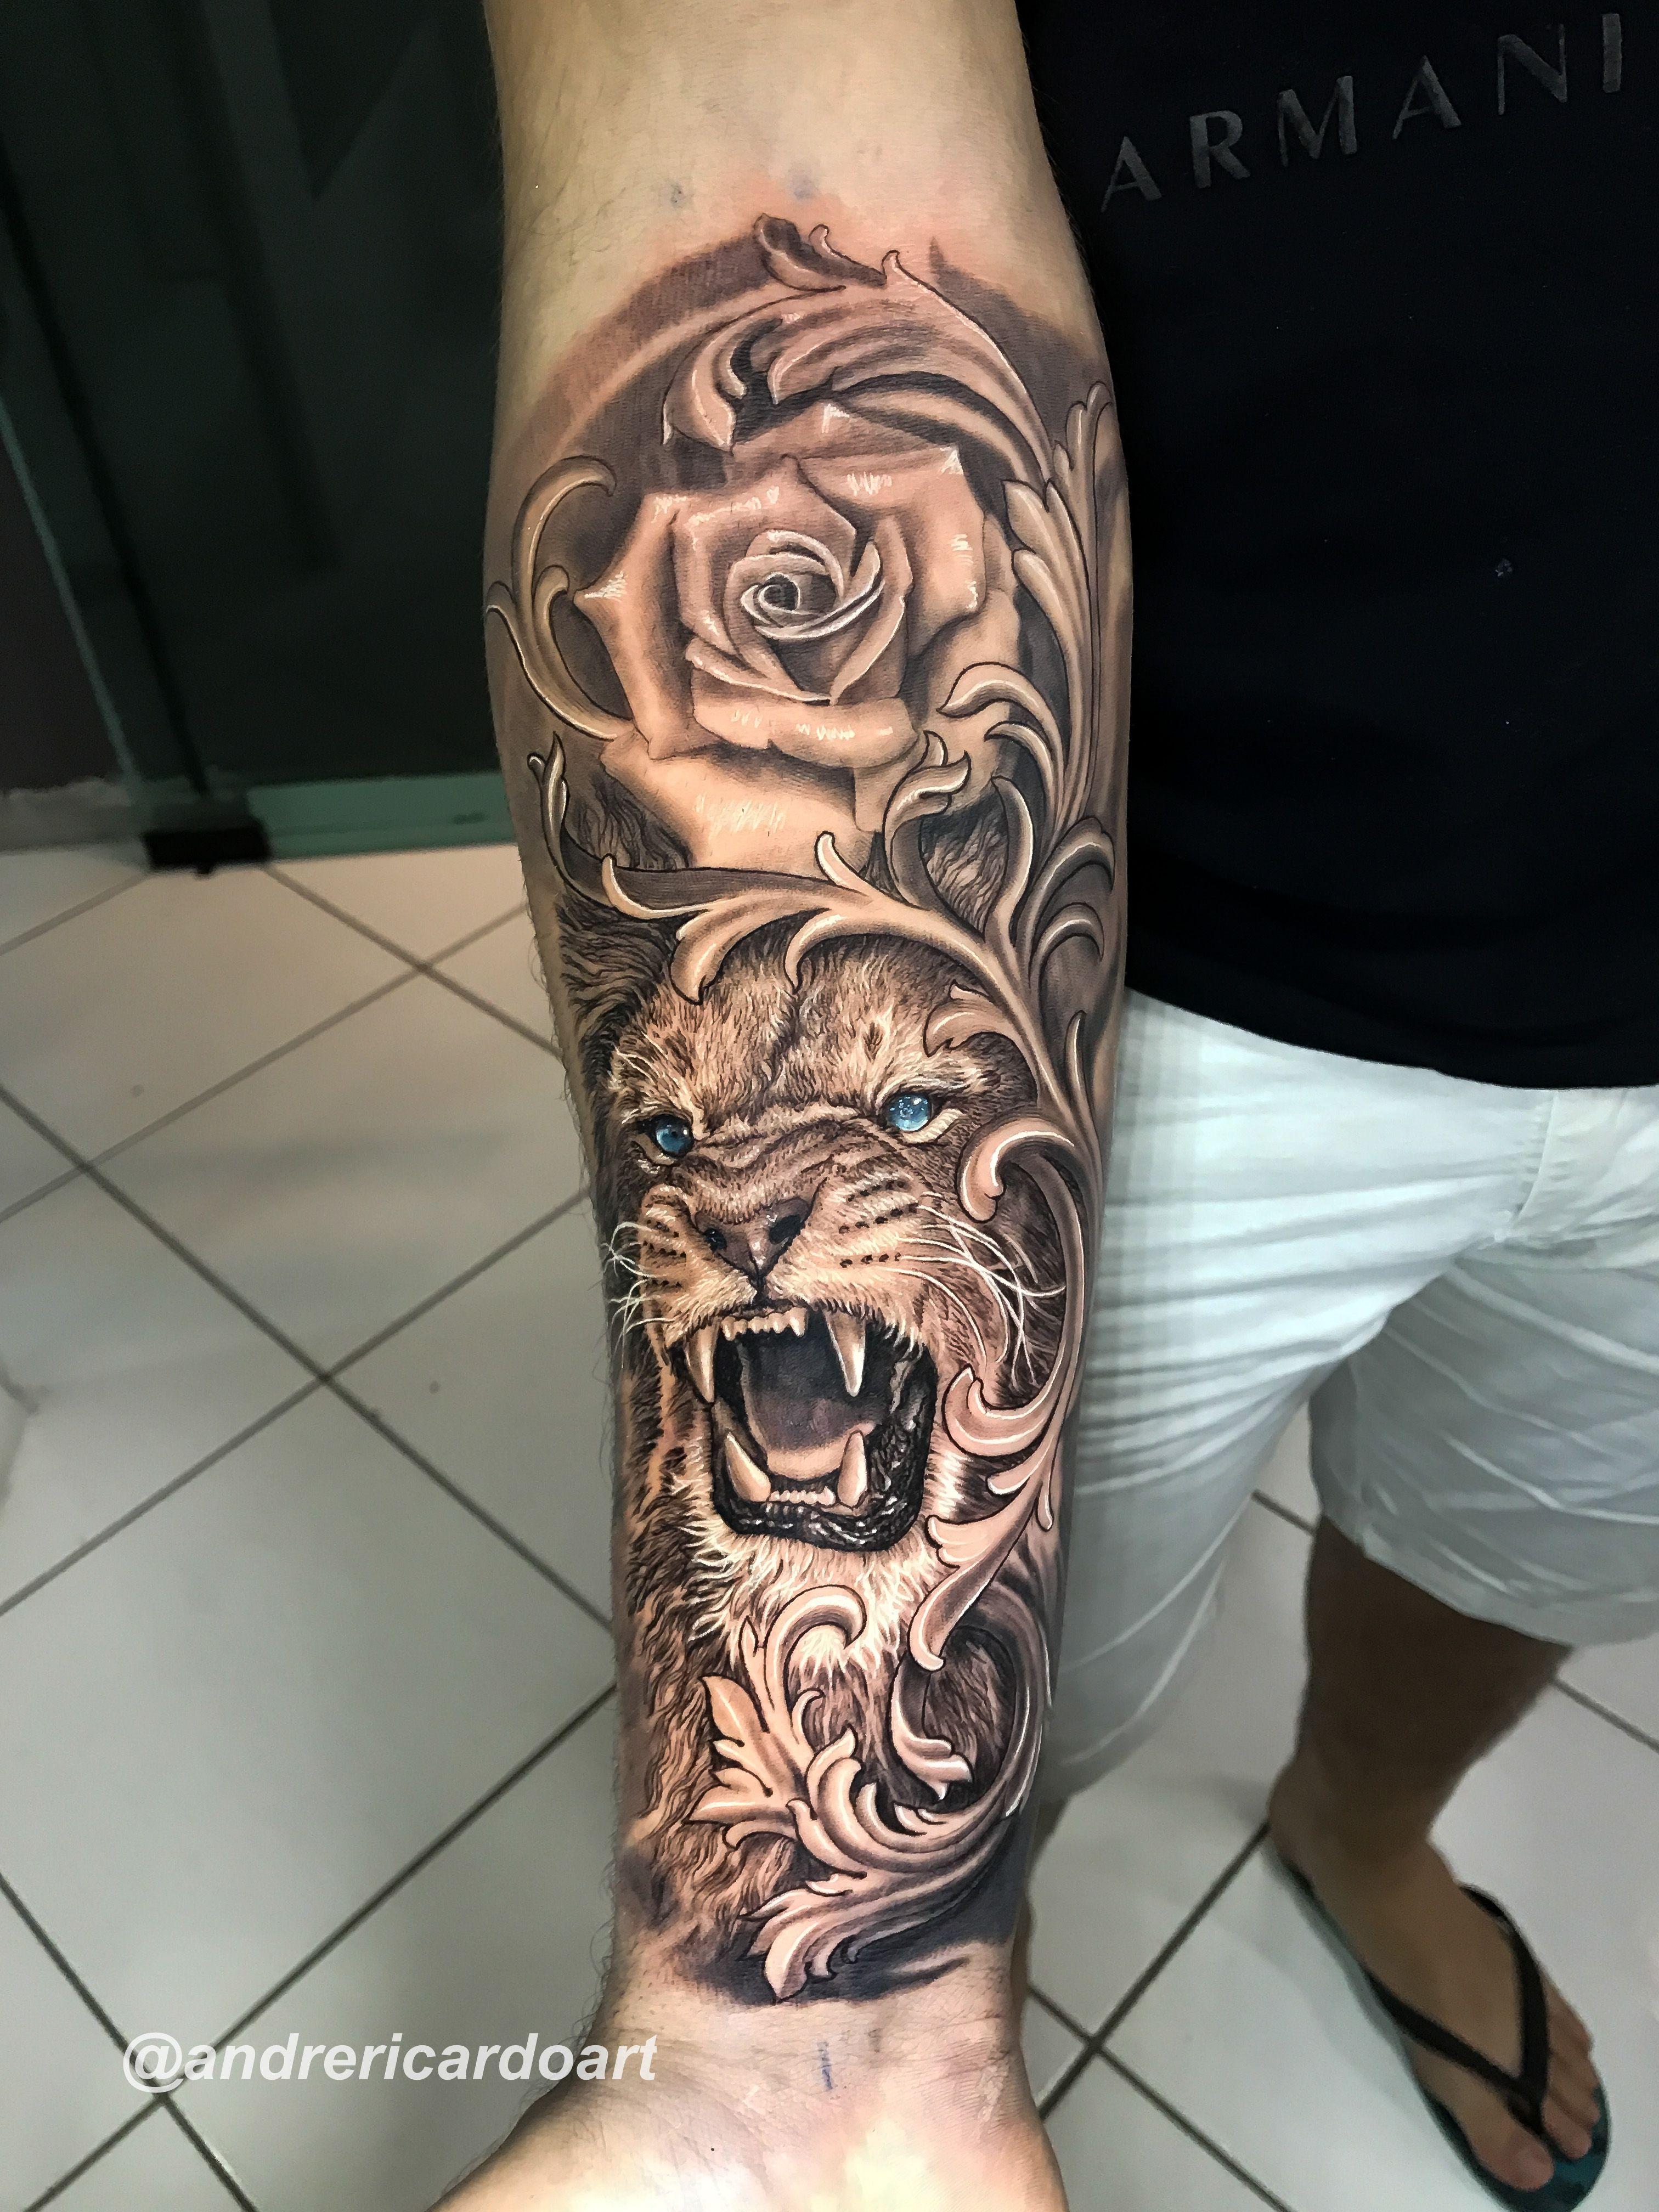 #tattoo #tatuagem #leao #lion #liontatto #realismotattoo